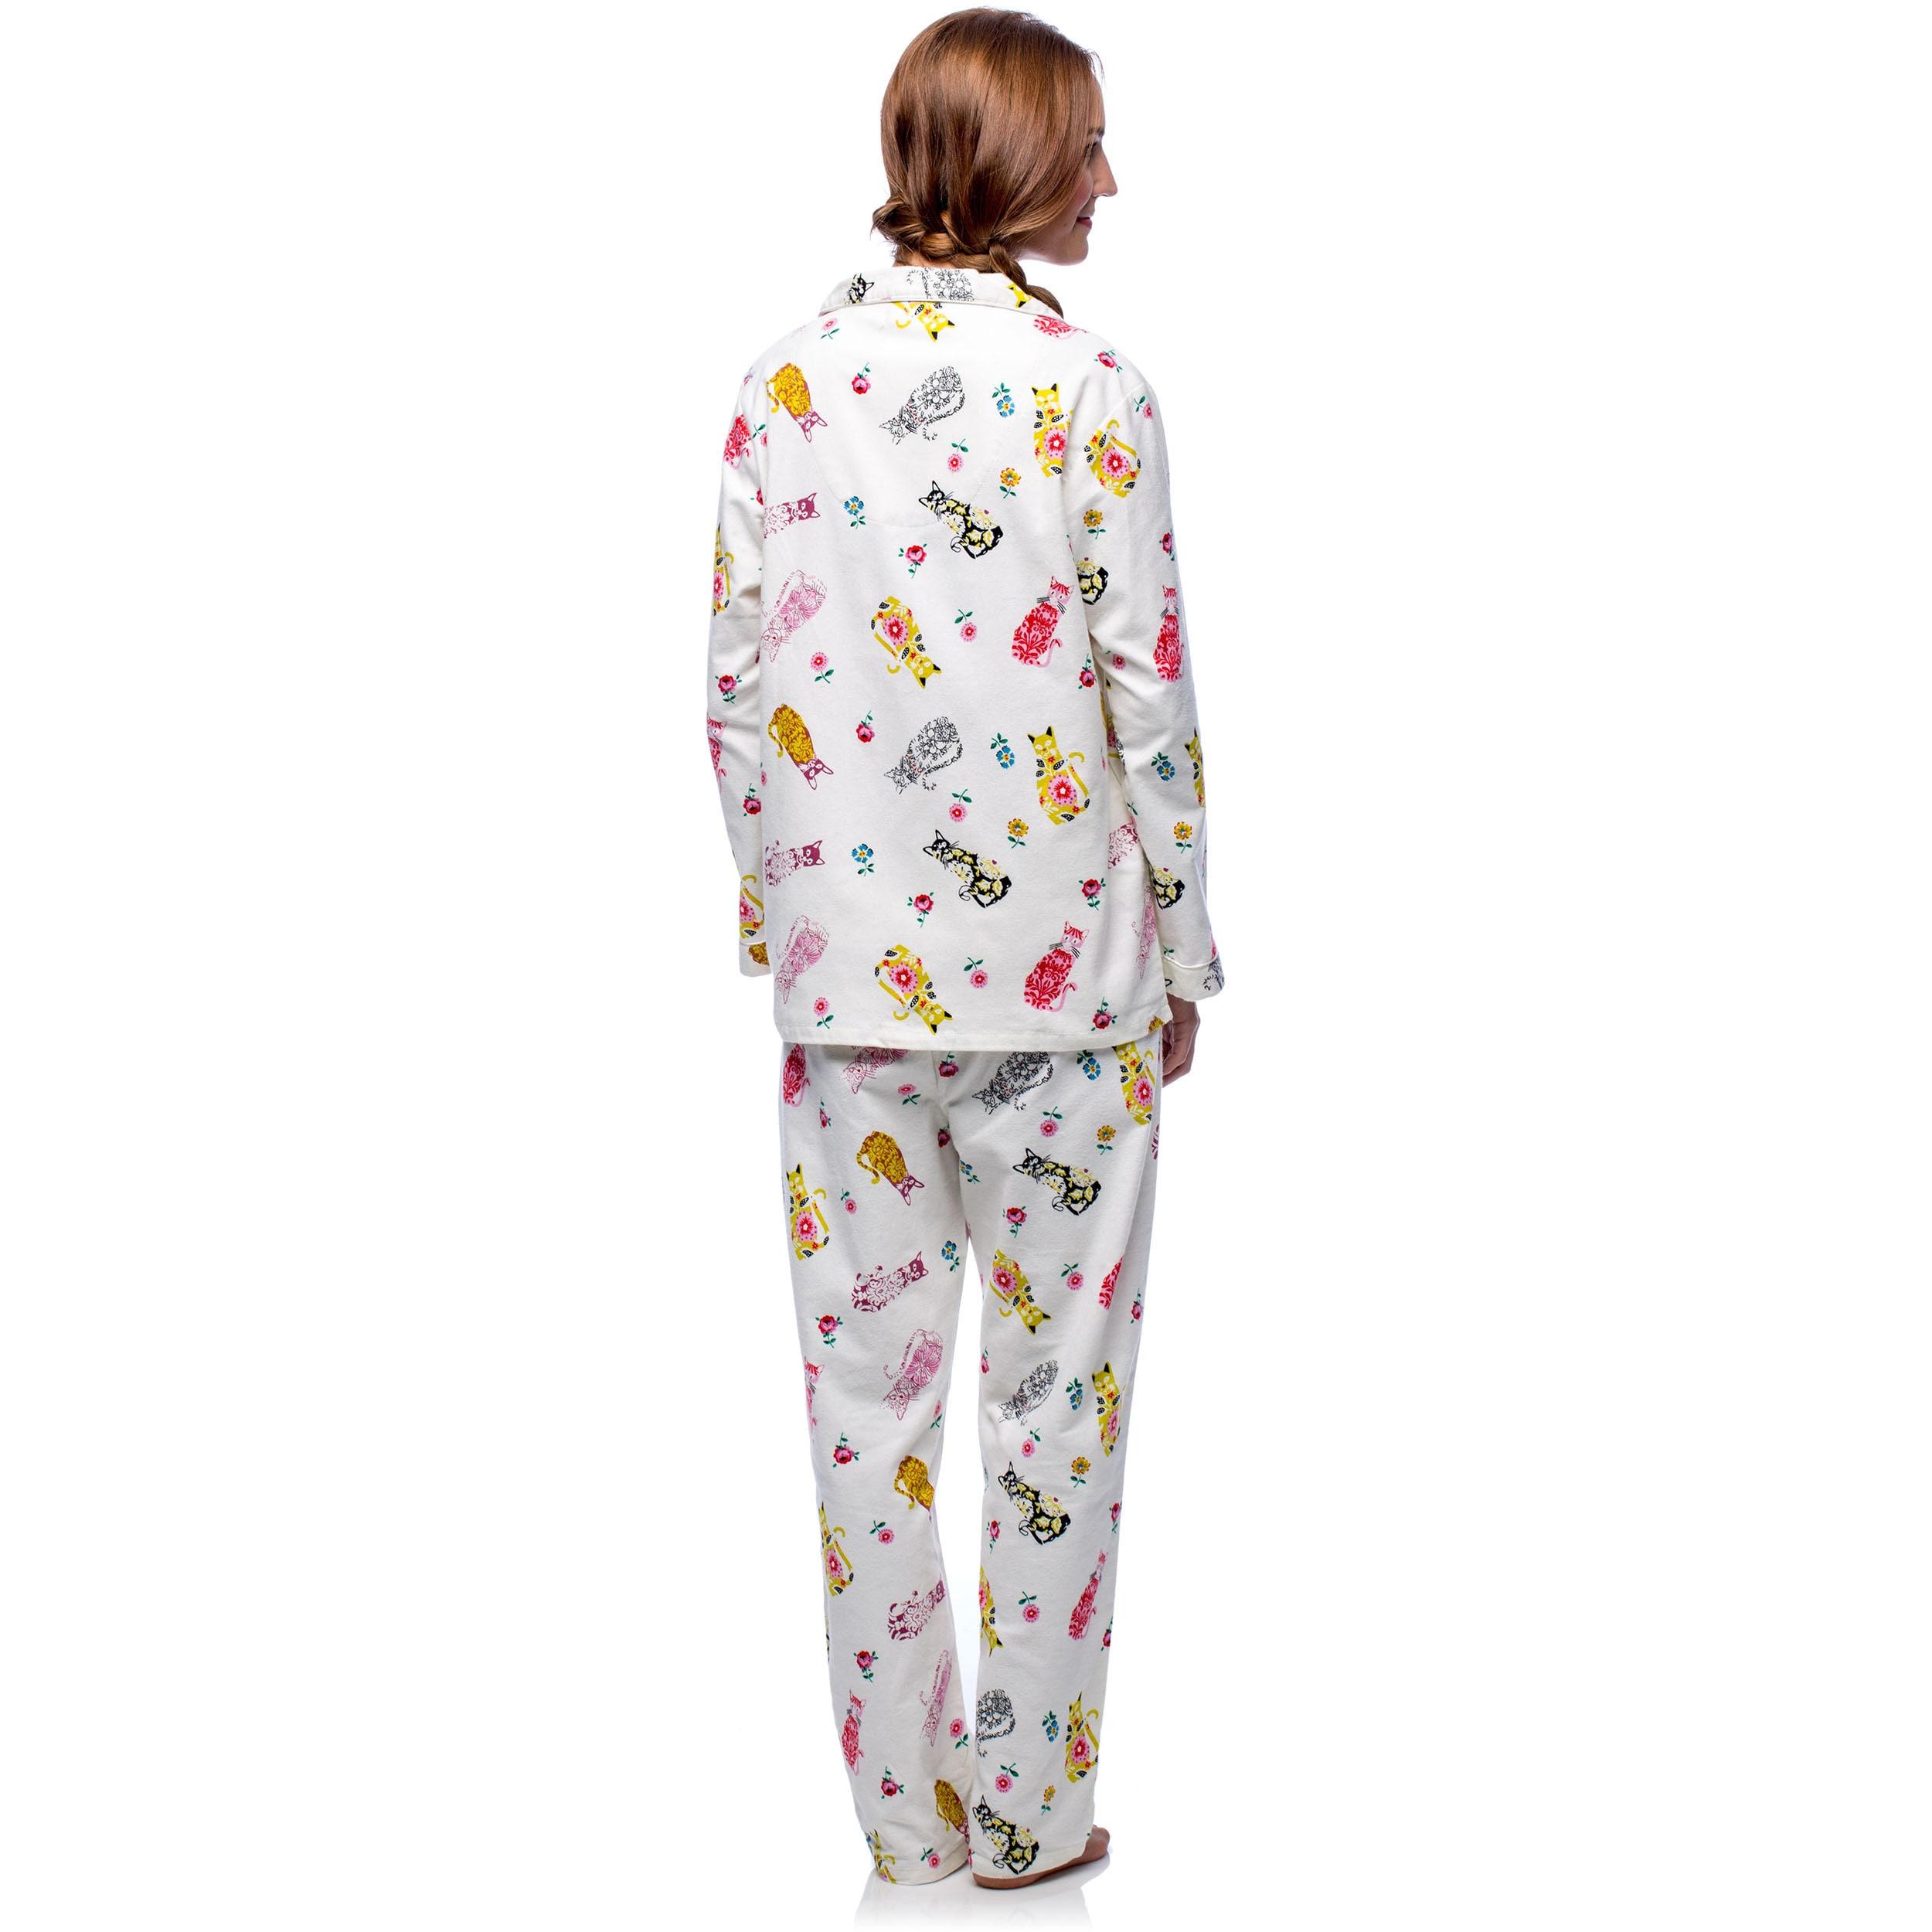 15da7a89b1 Shop La Cera Women s Cat Print Cotton Flannel Pajama Set - Free Shipping  Today - Overstock - 10706613